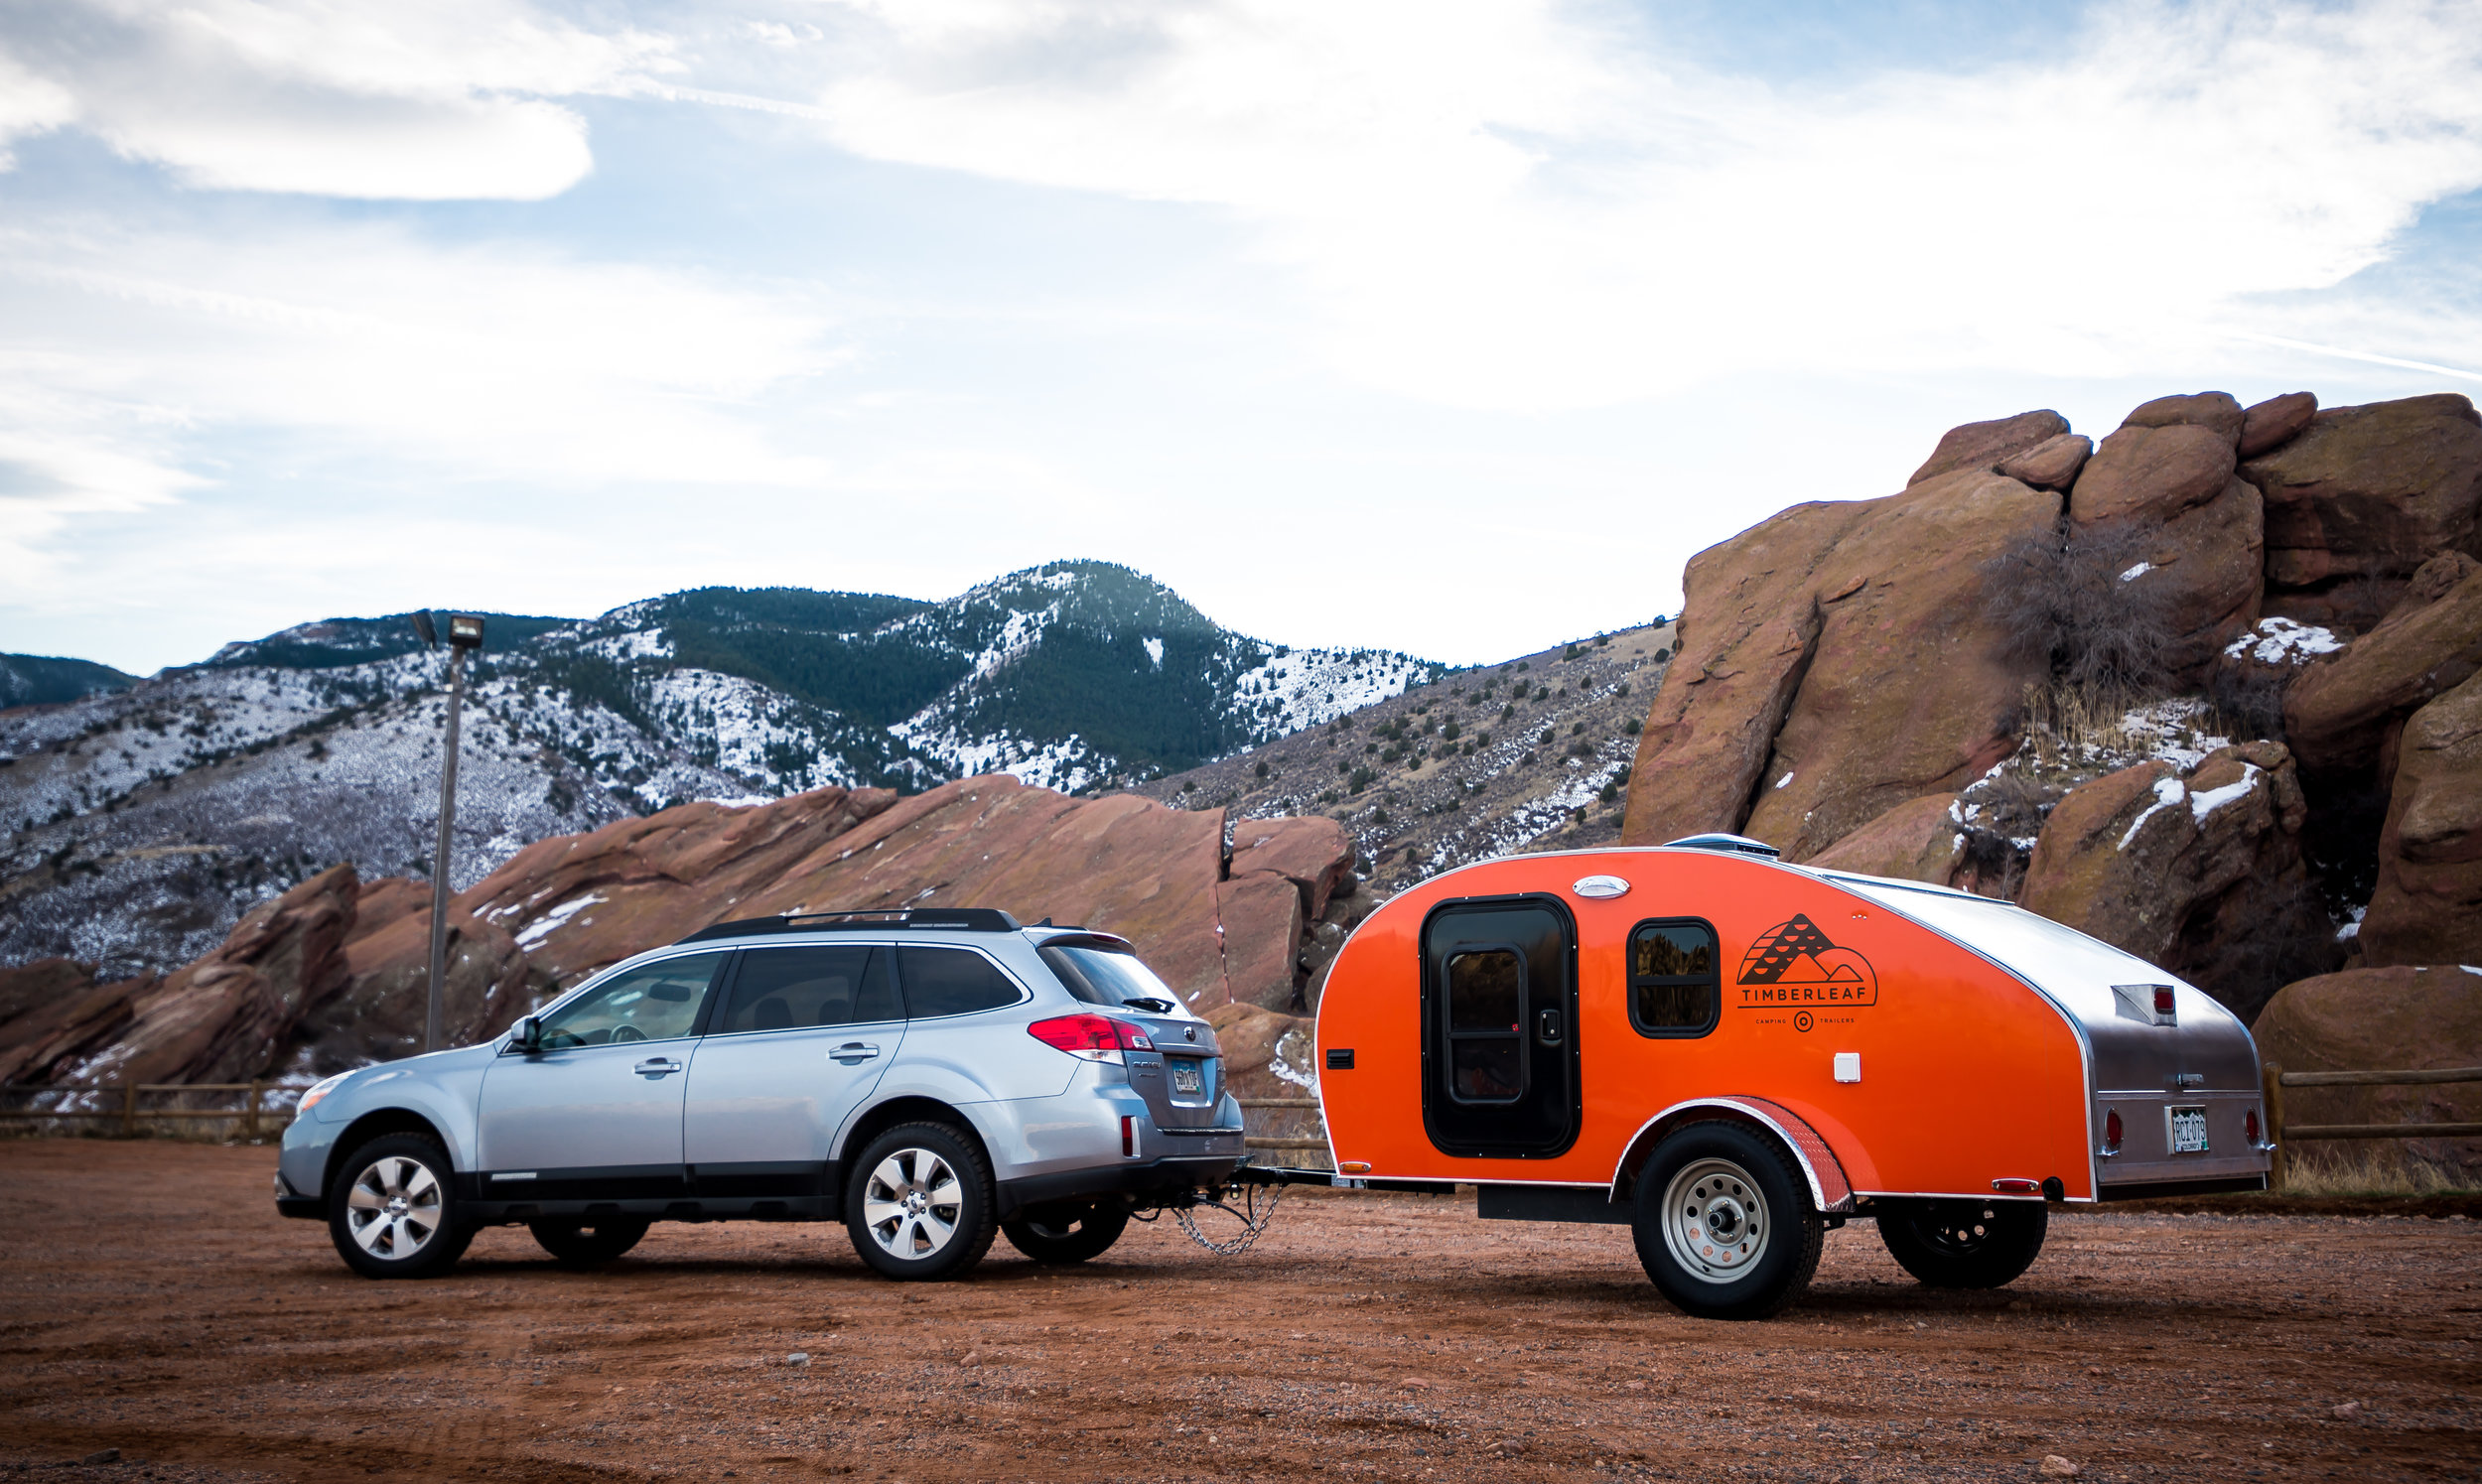 Timberleaf Teardrop Trailer behind a Subaru Outback